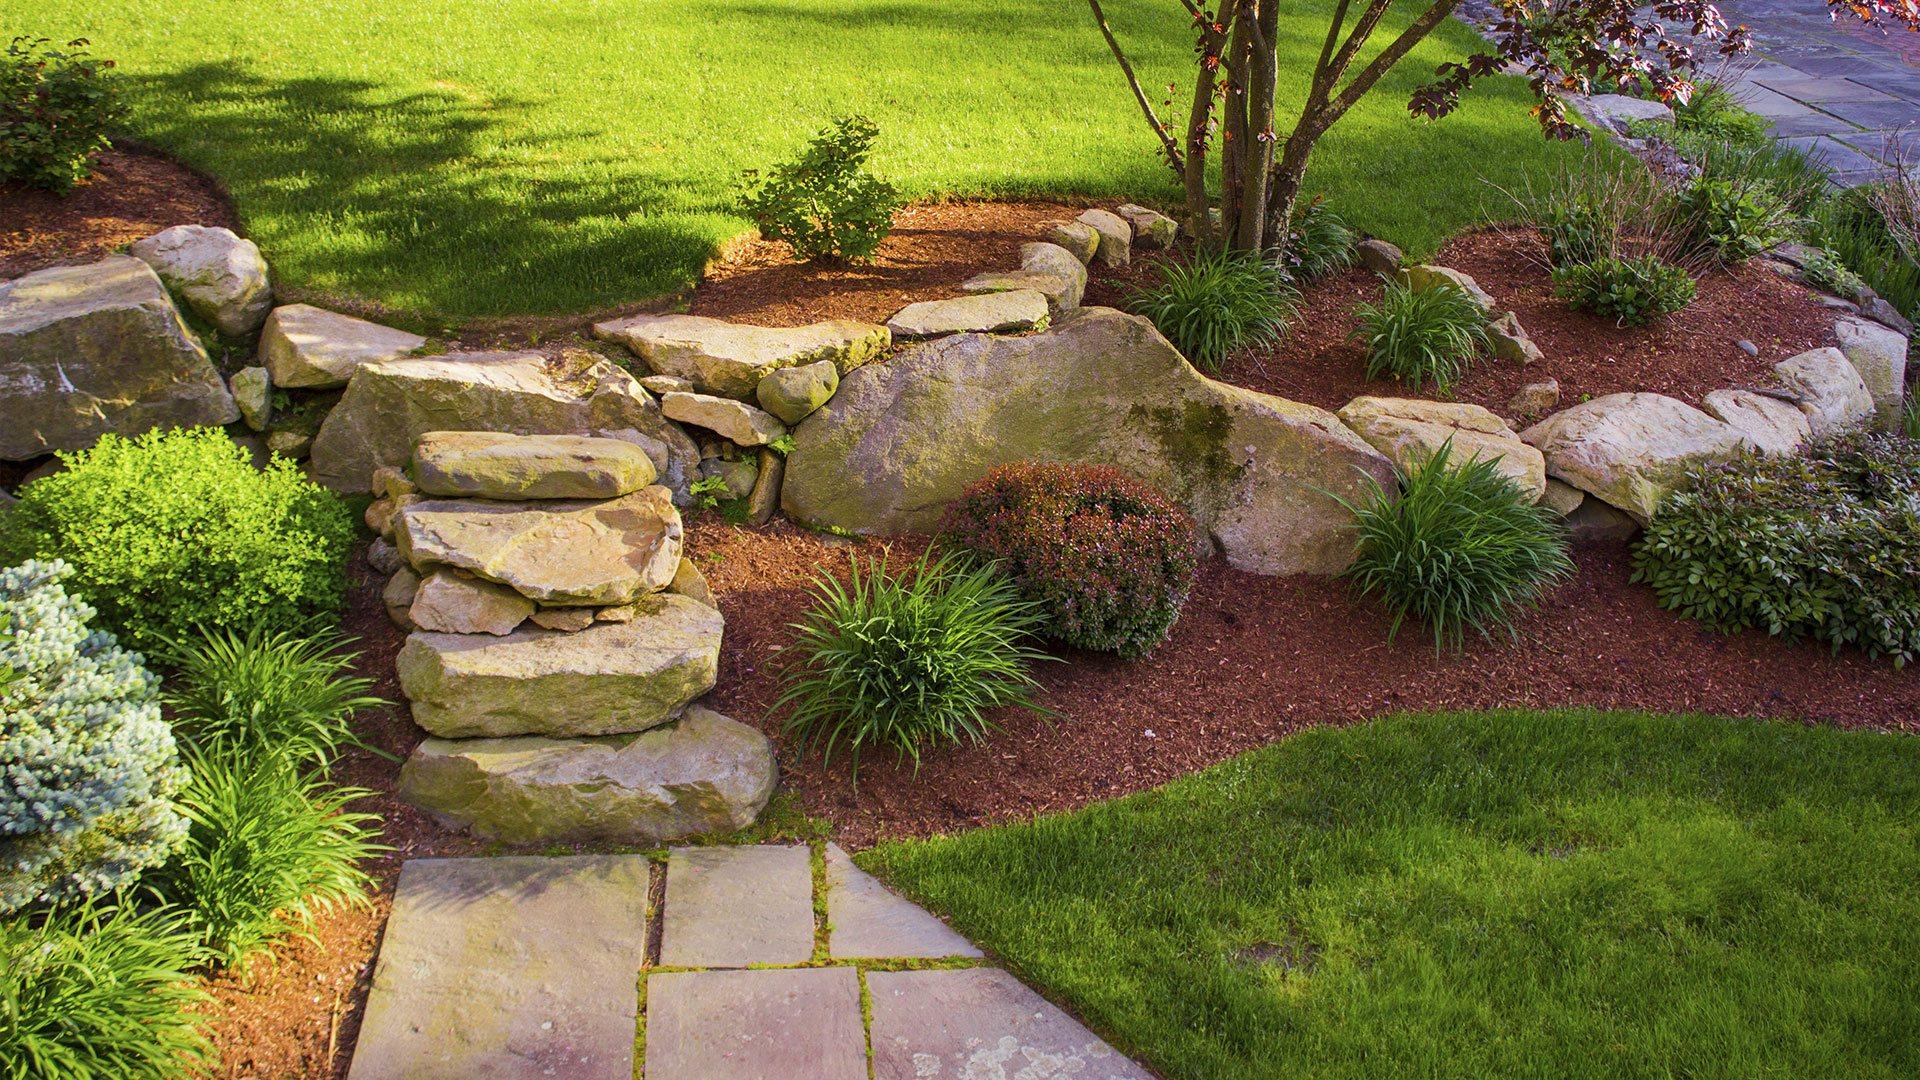 Dakota Turf Landscaping Company, Landscaper and Landscaping Services slide 3